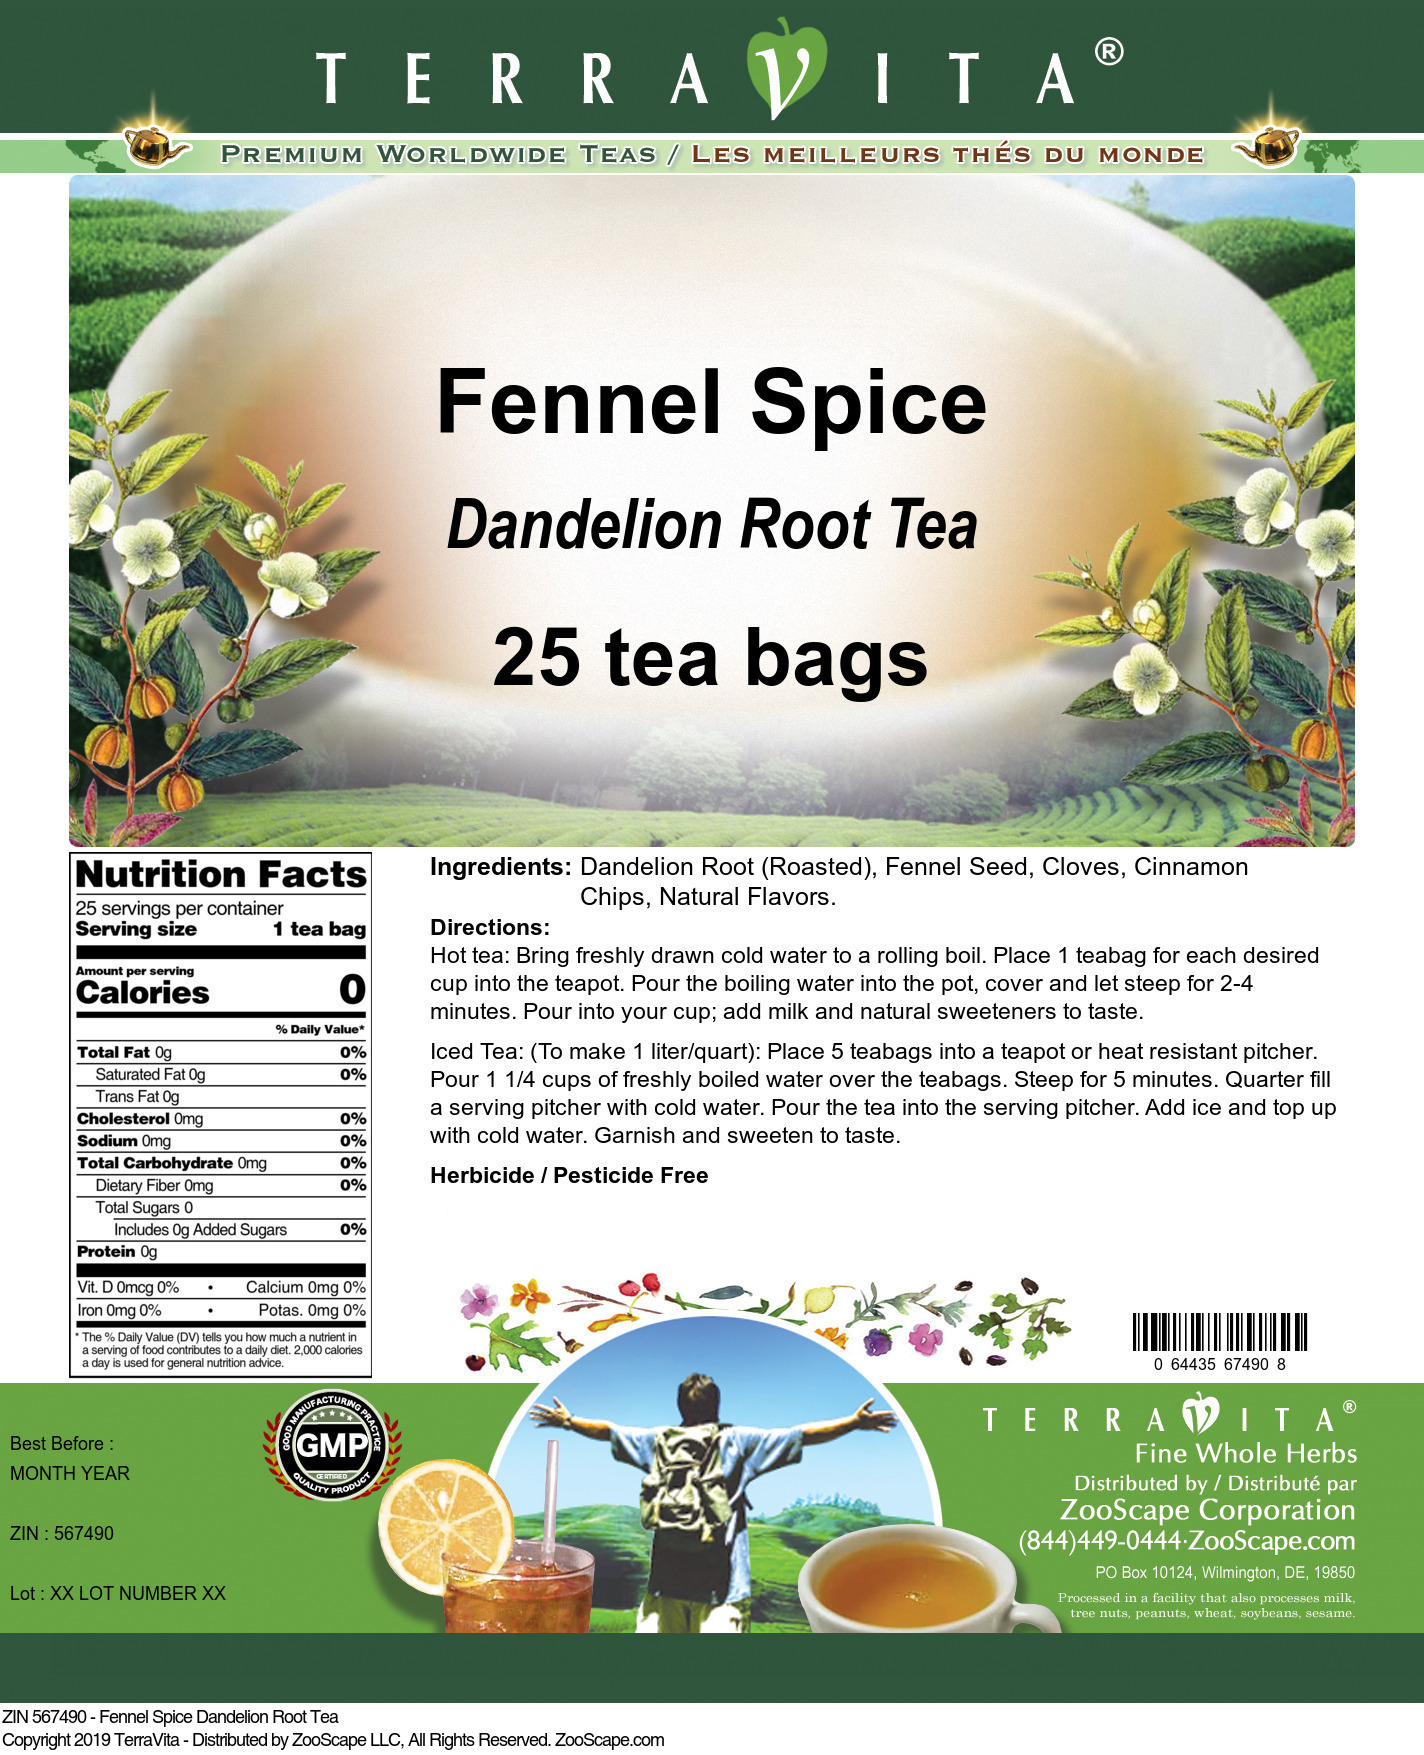 Fennel Spice Dandelion Root